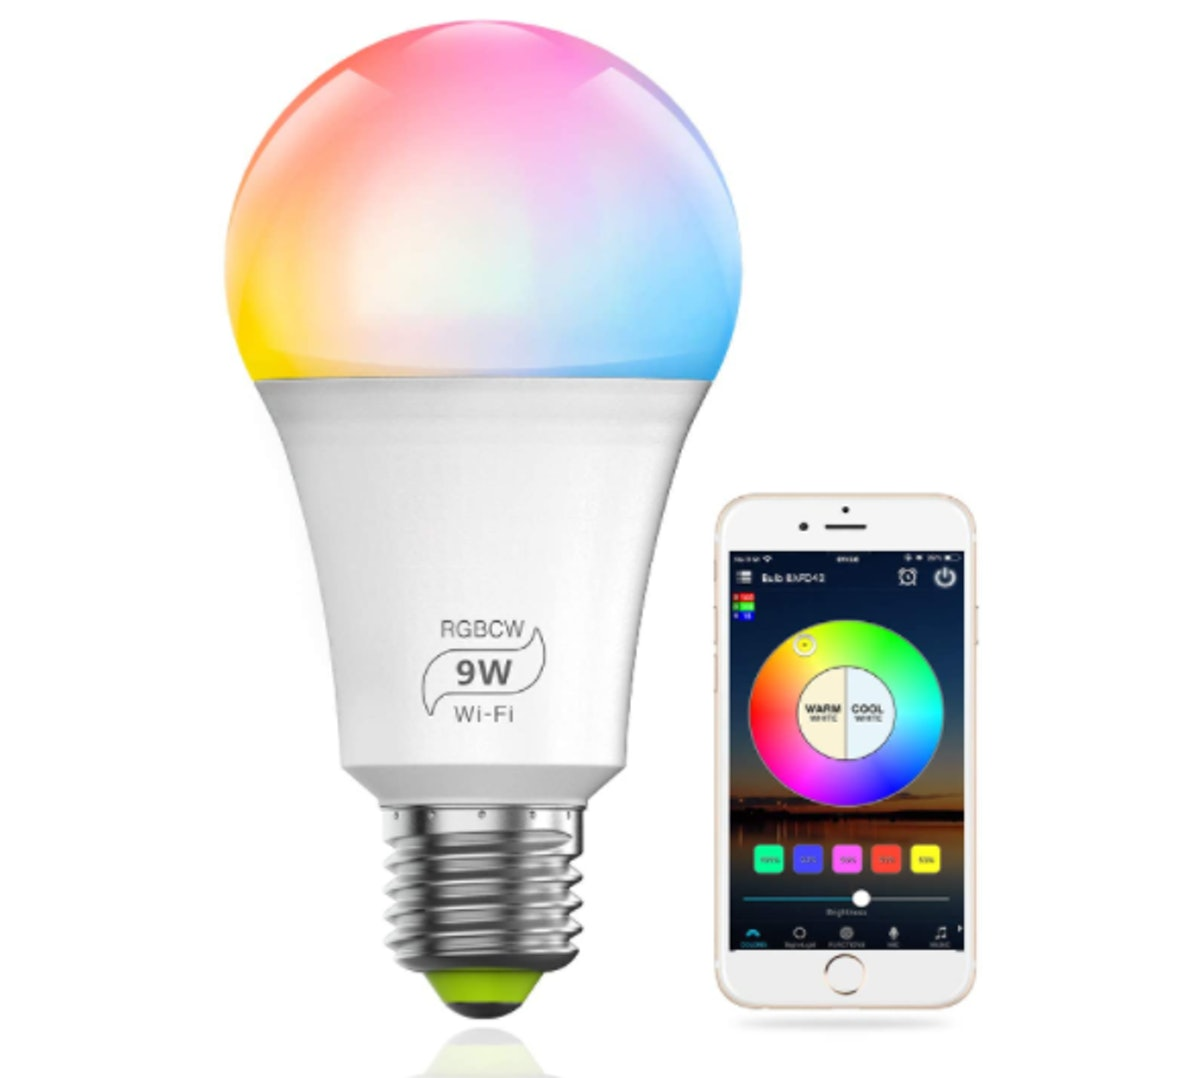 MagicLight Smart Lightbulb